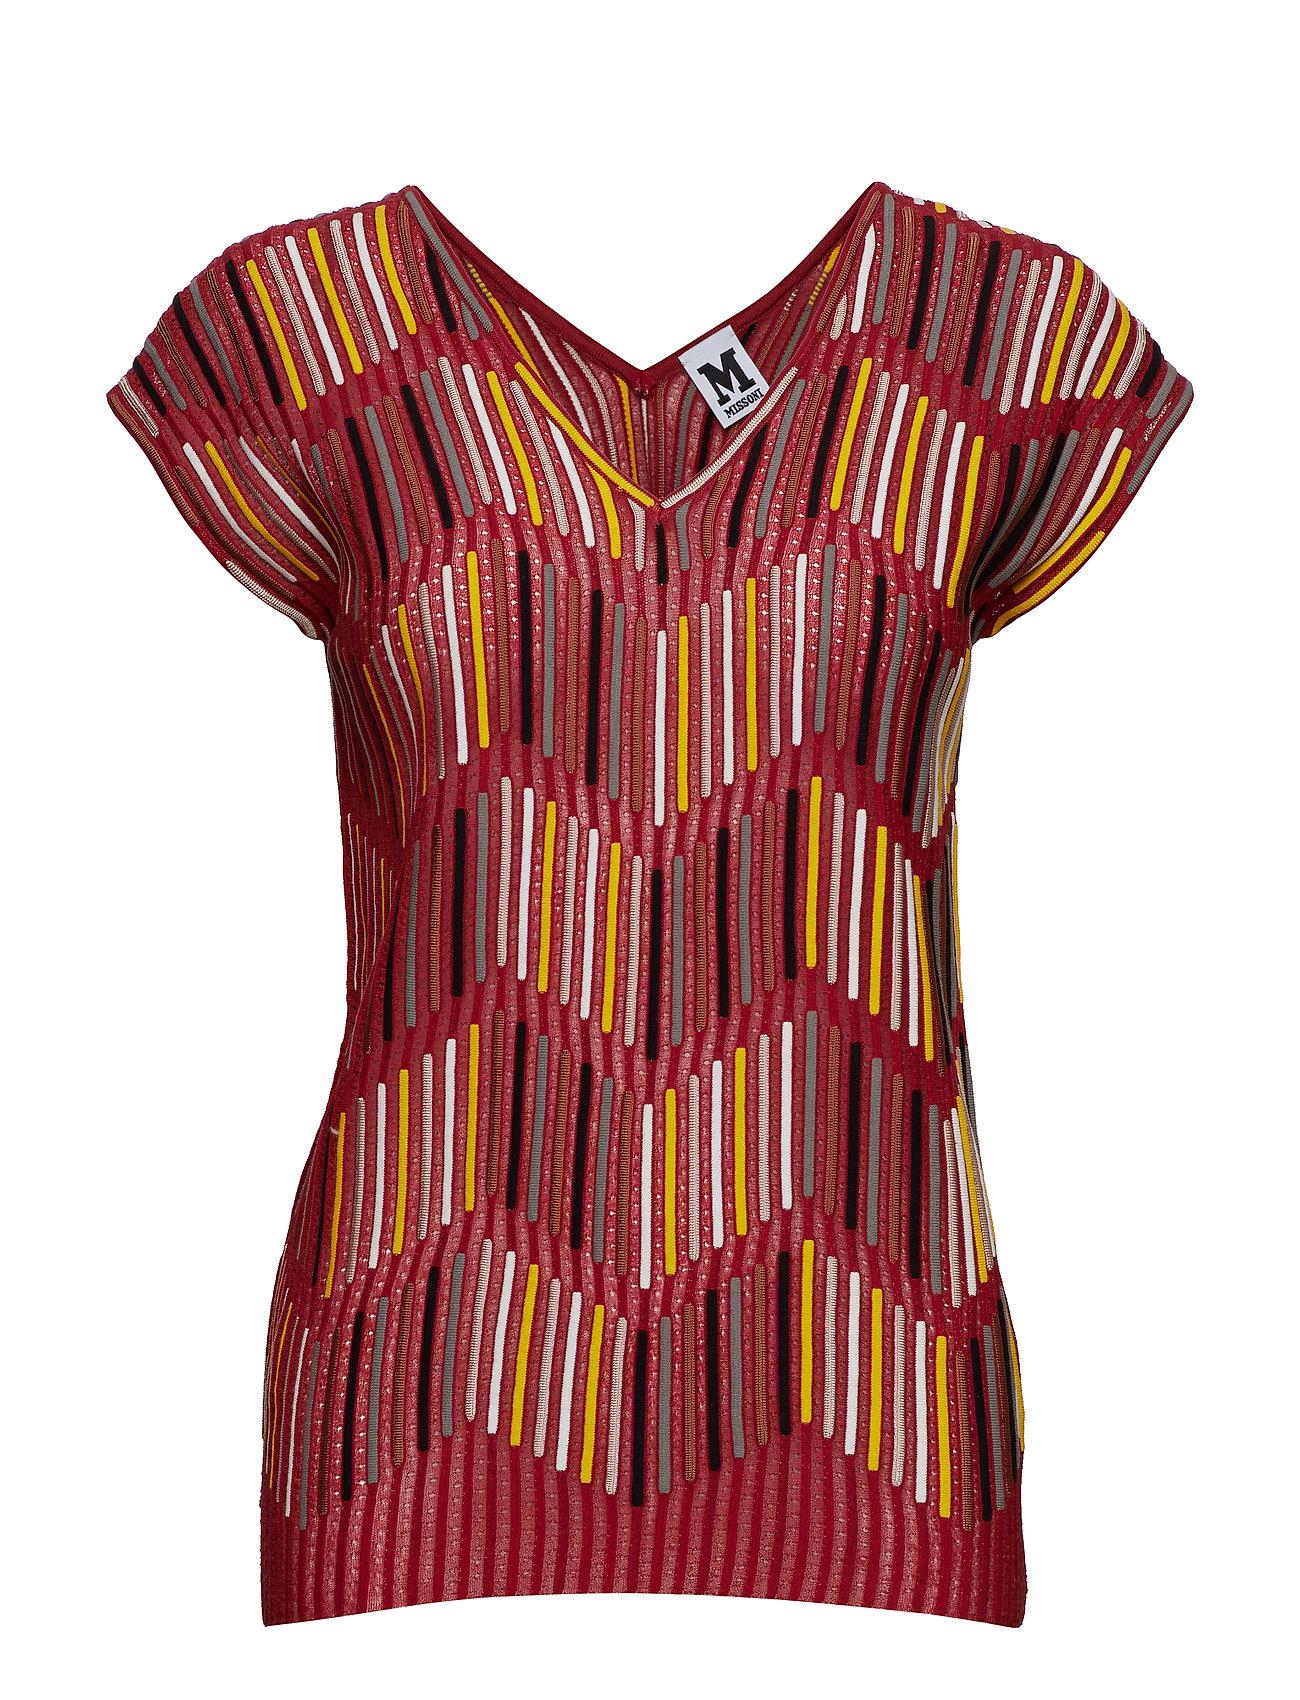 Image of 2dn00096-2k002b T-shirt Top Rød M Missoni (3200532473)